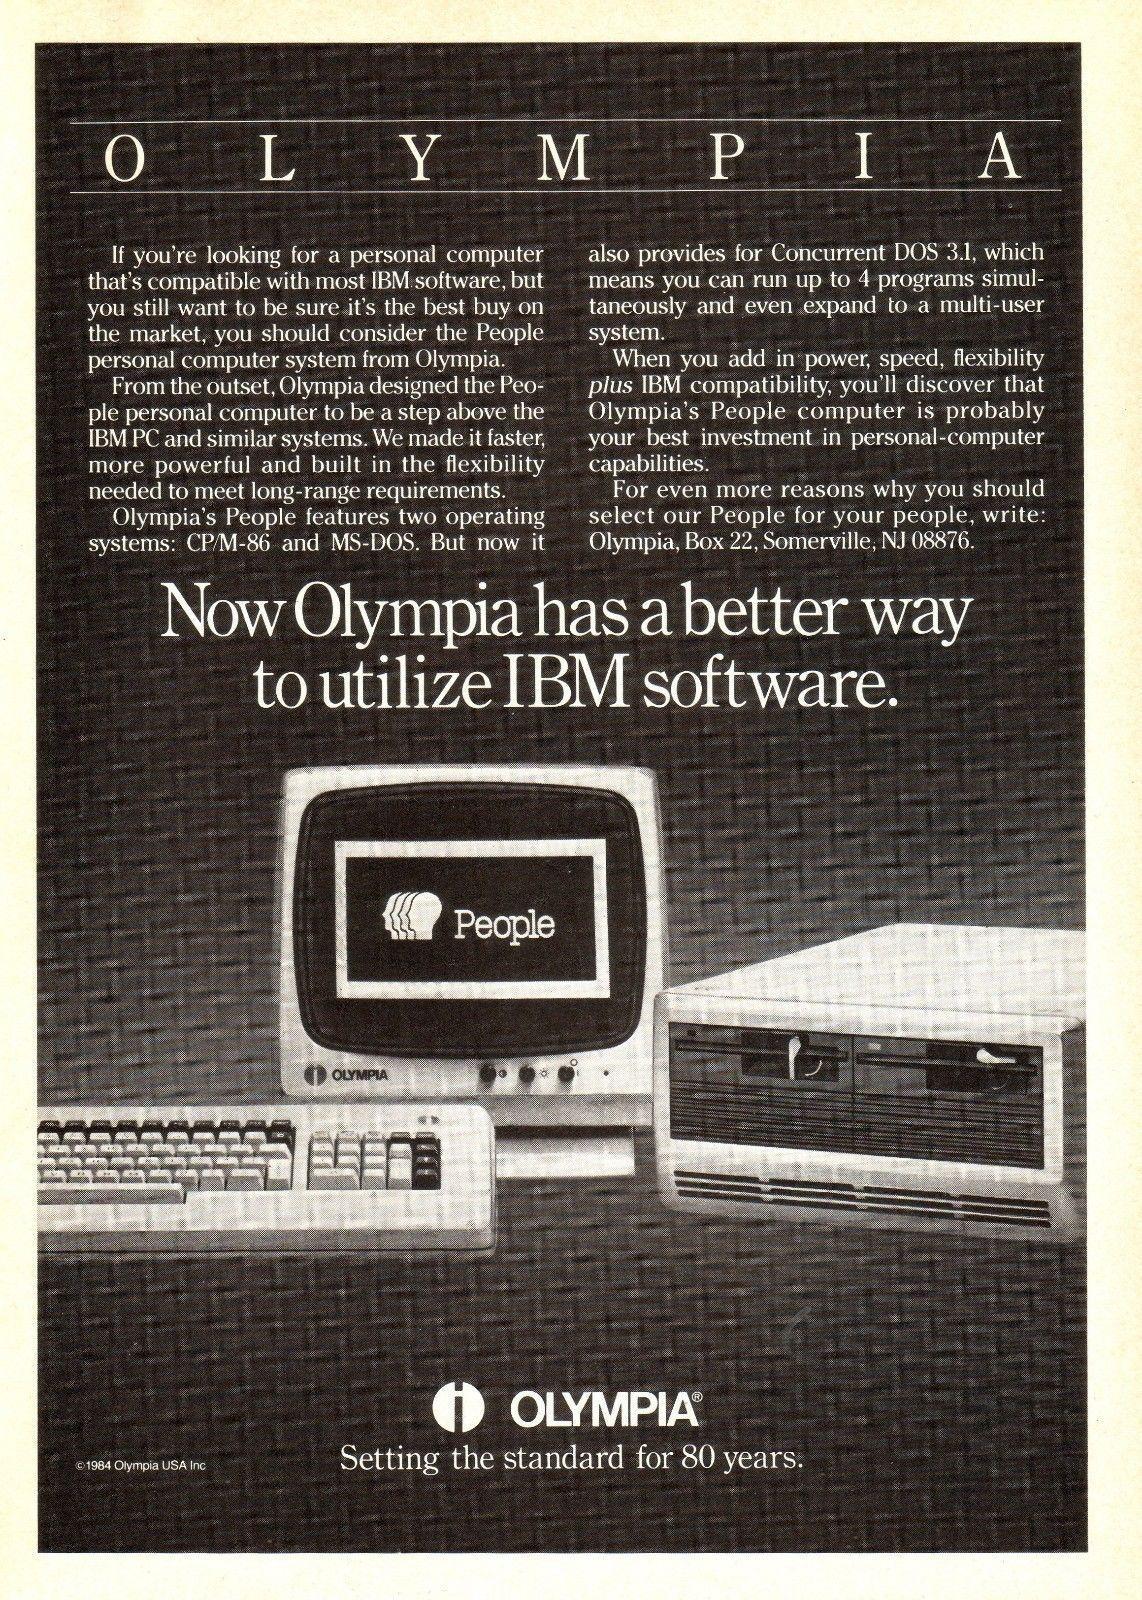 Olympia People microcomputer system.JPG